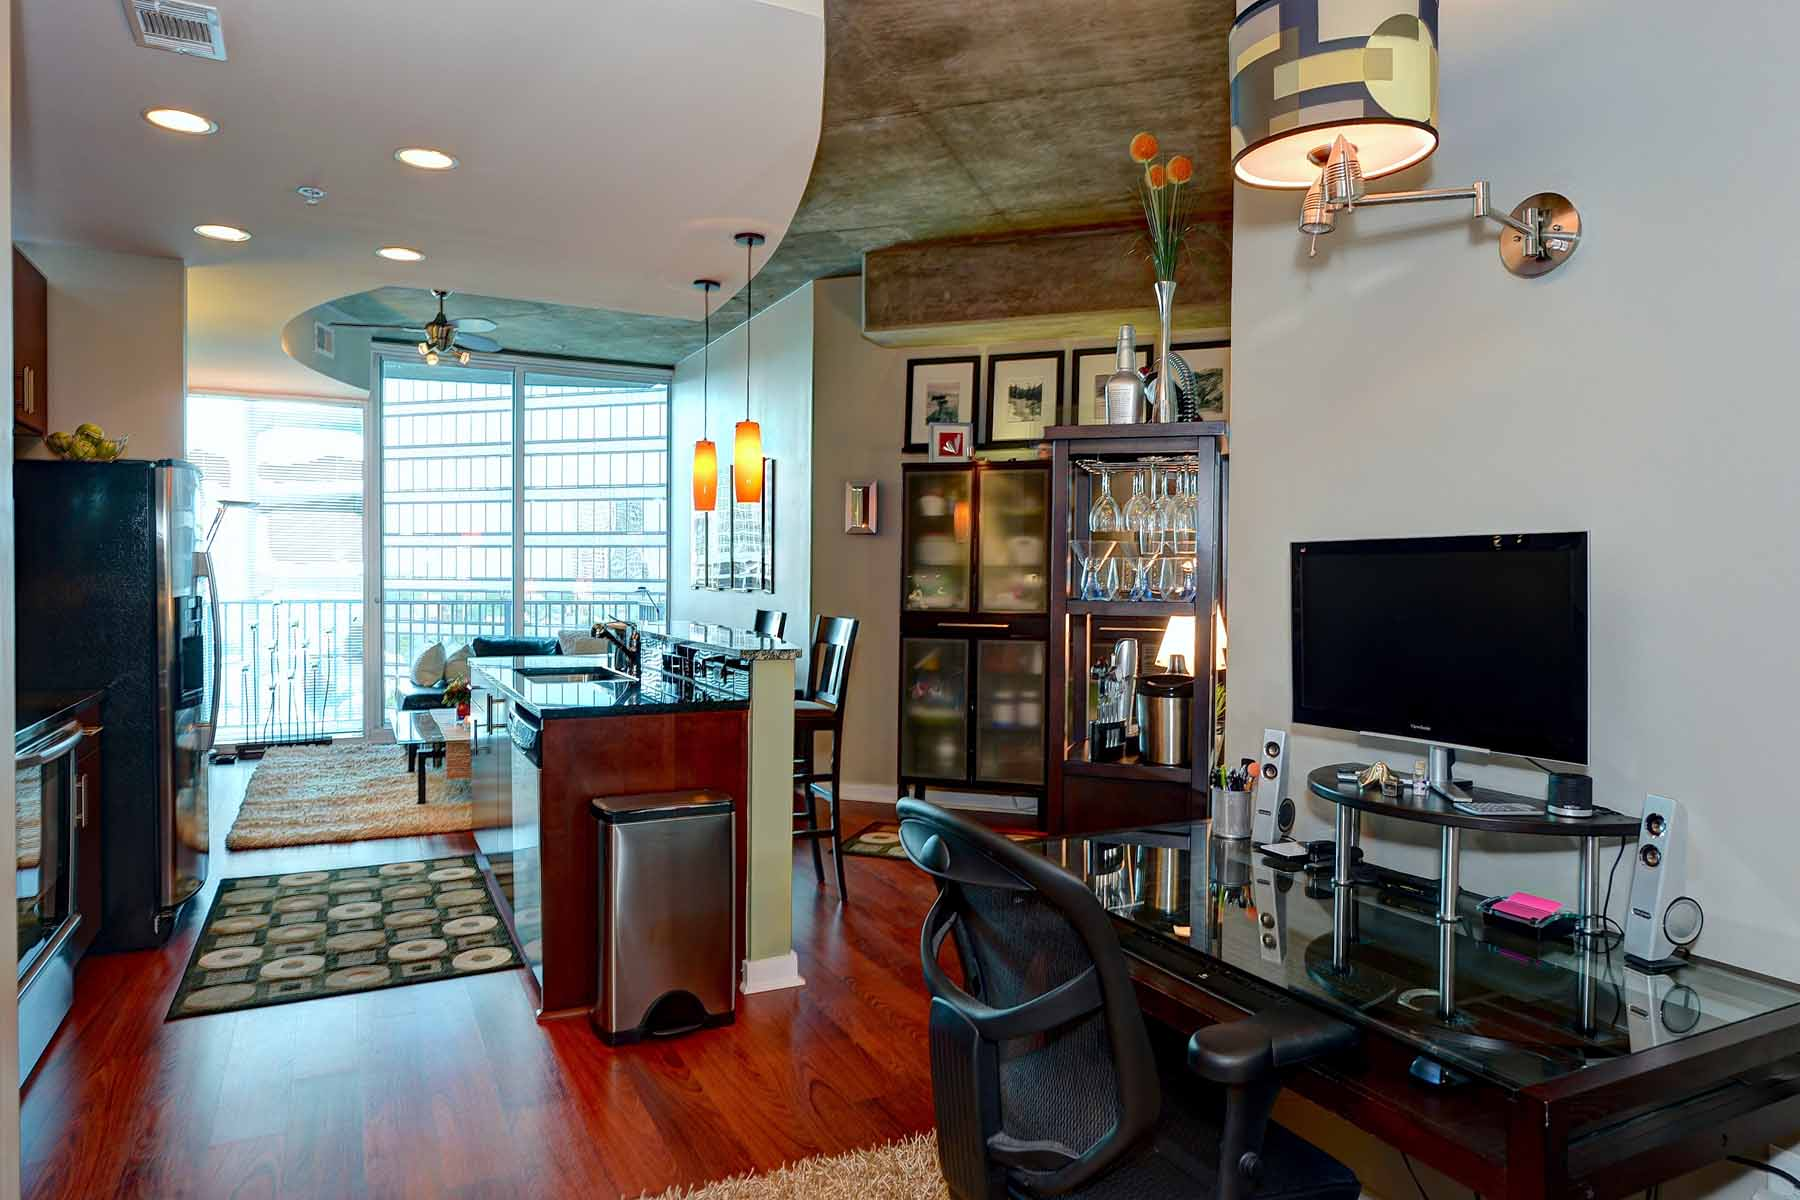 Condominium for Sale at Amazing high rise condo facing Northeast with a Midtown view! 400 West Peachtree Street NE Unit 1014 Atlanta, Georgia 30308 United States